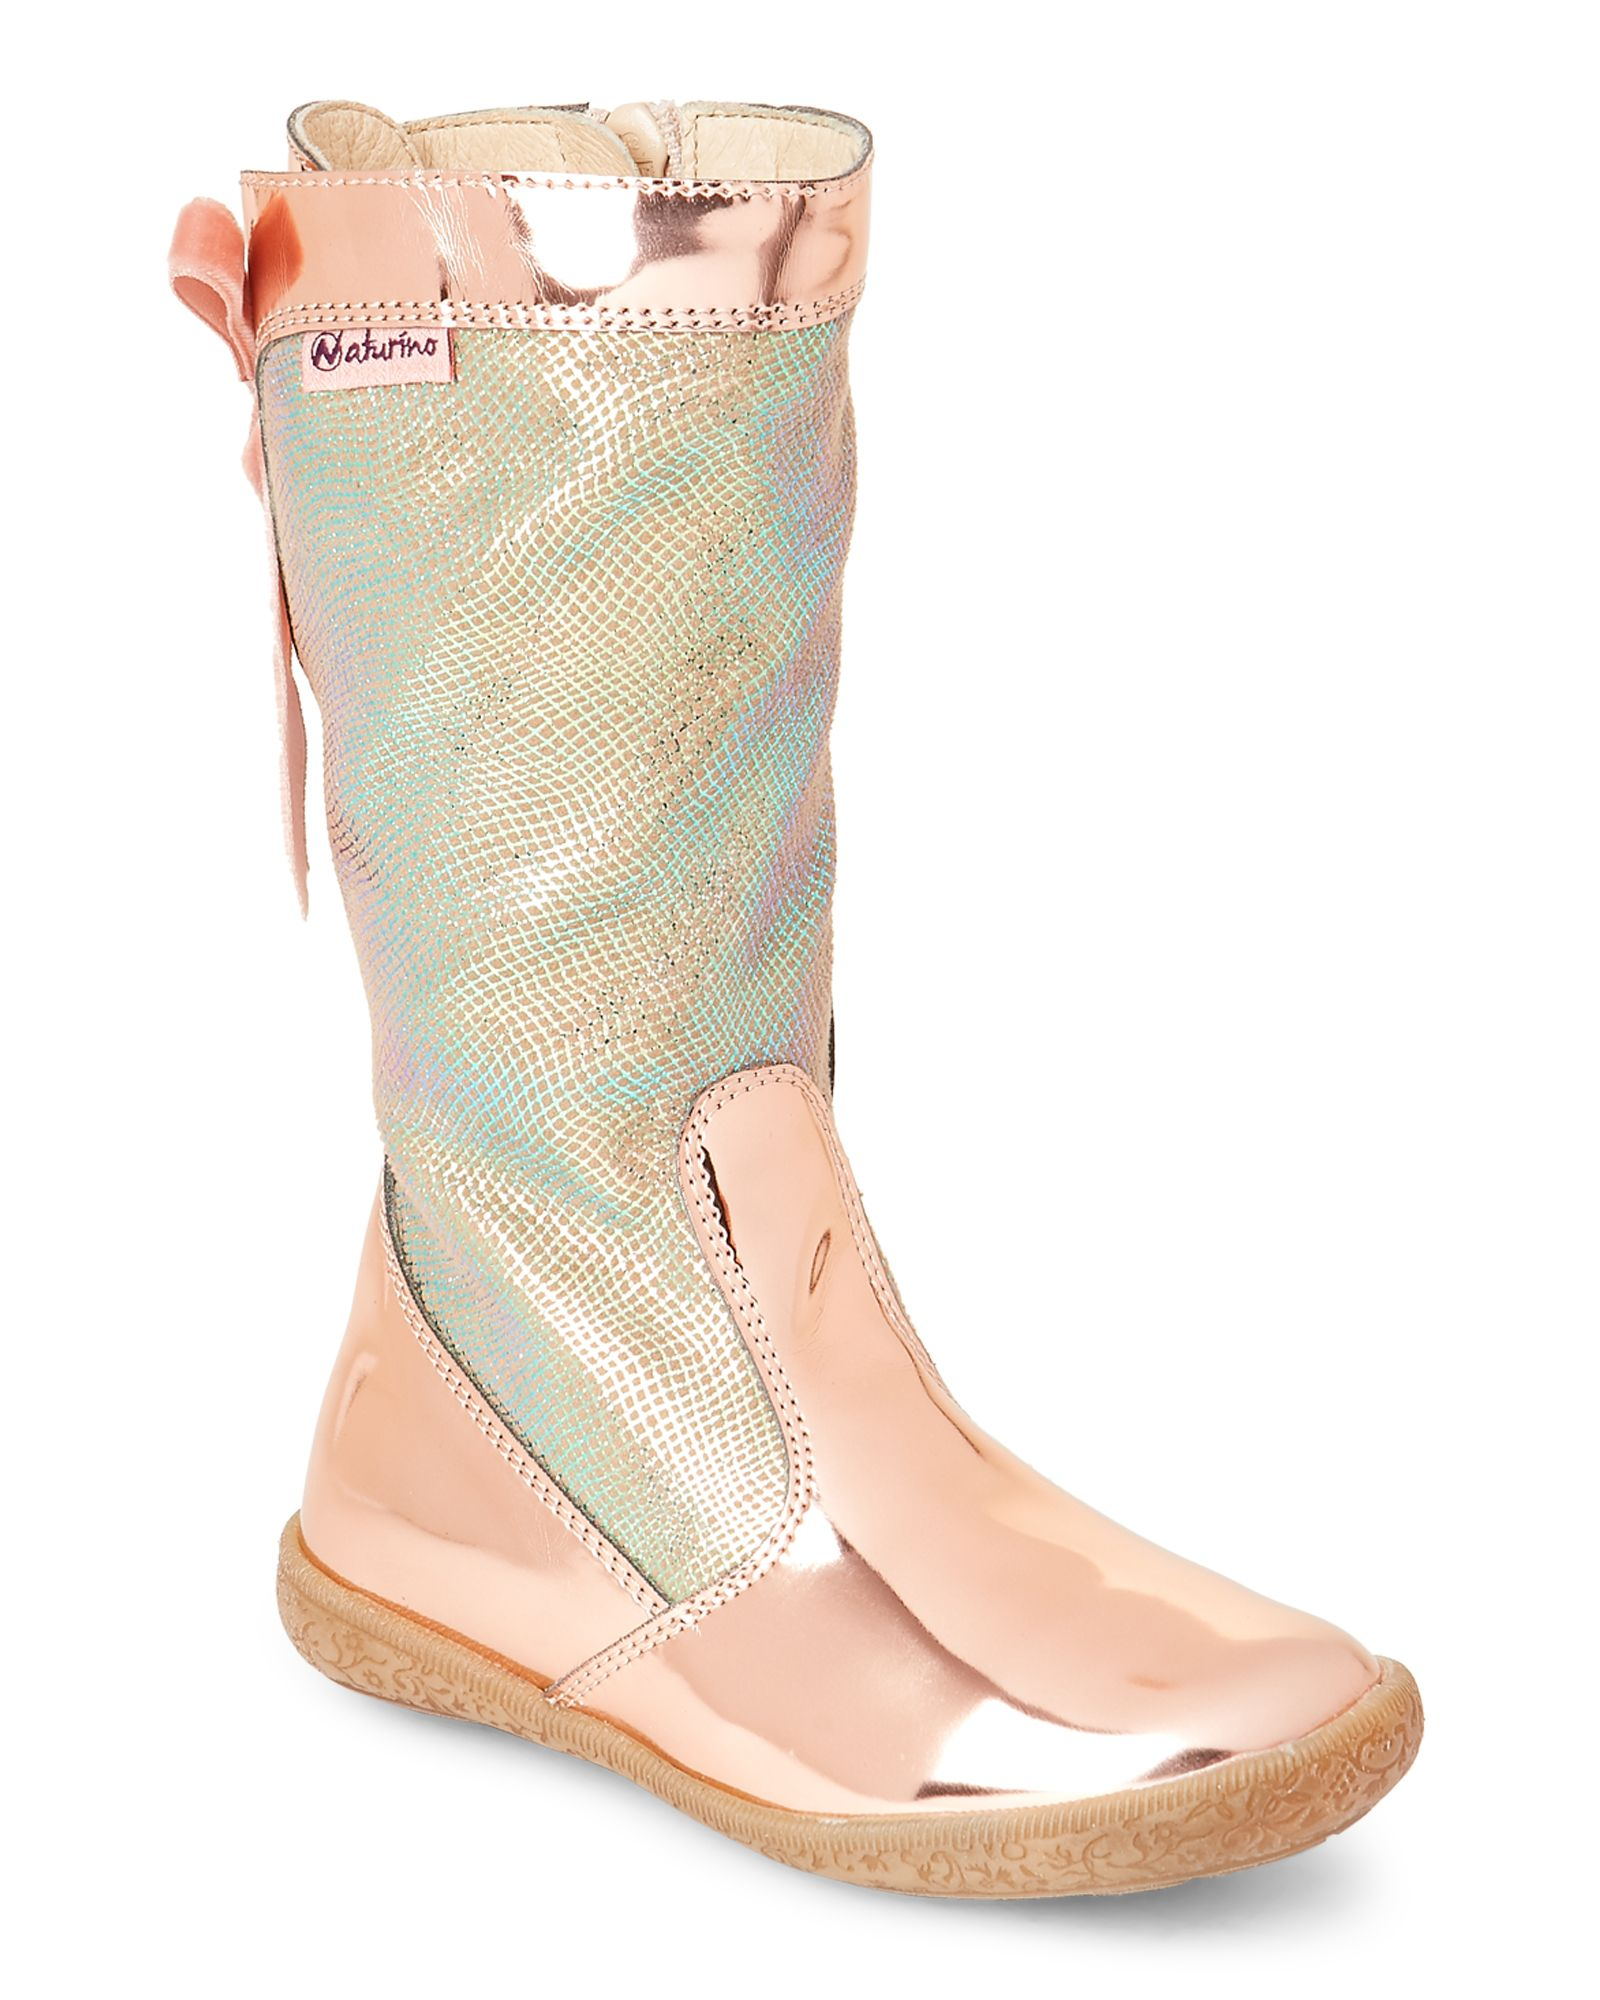 e8a76878263 Naturino (Toddler Kids Girls) Pink Metallic Lace-Back Boots